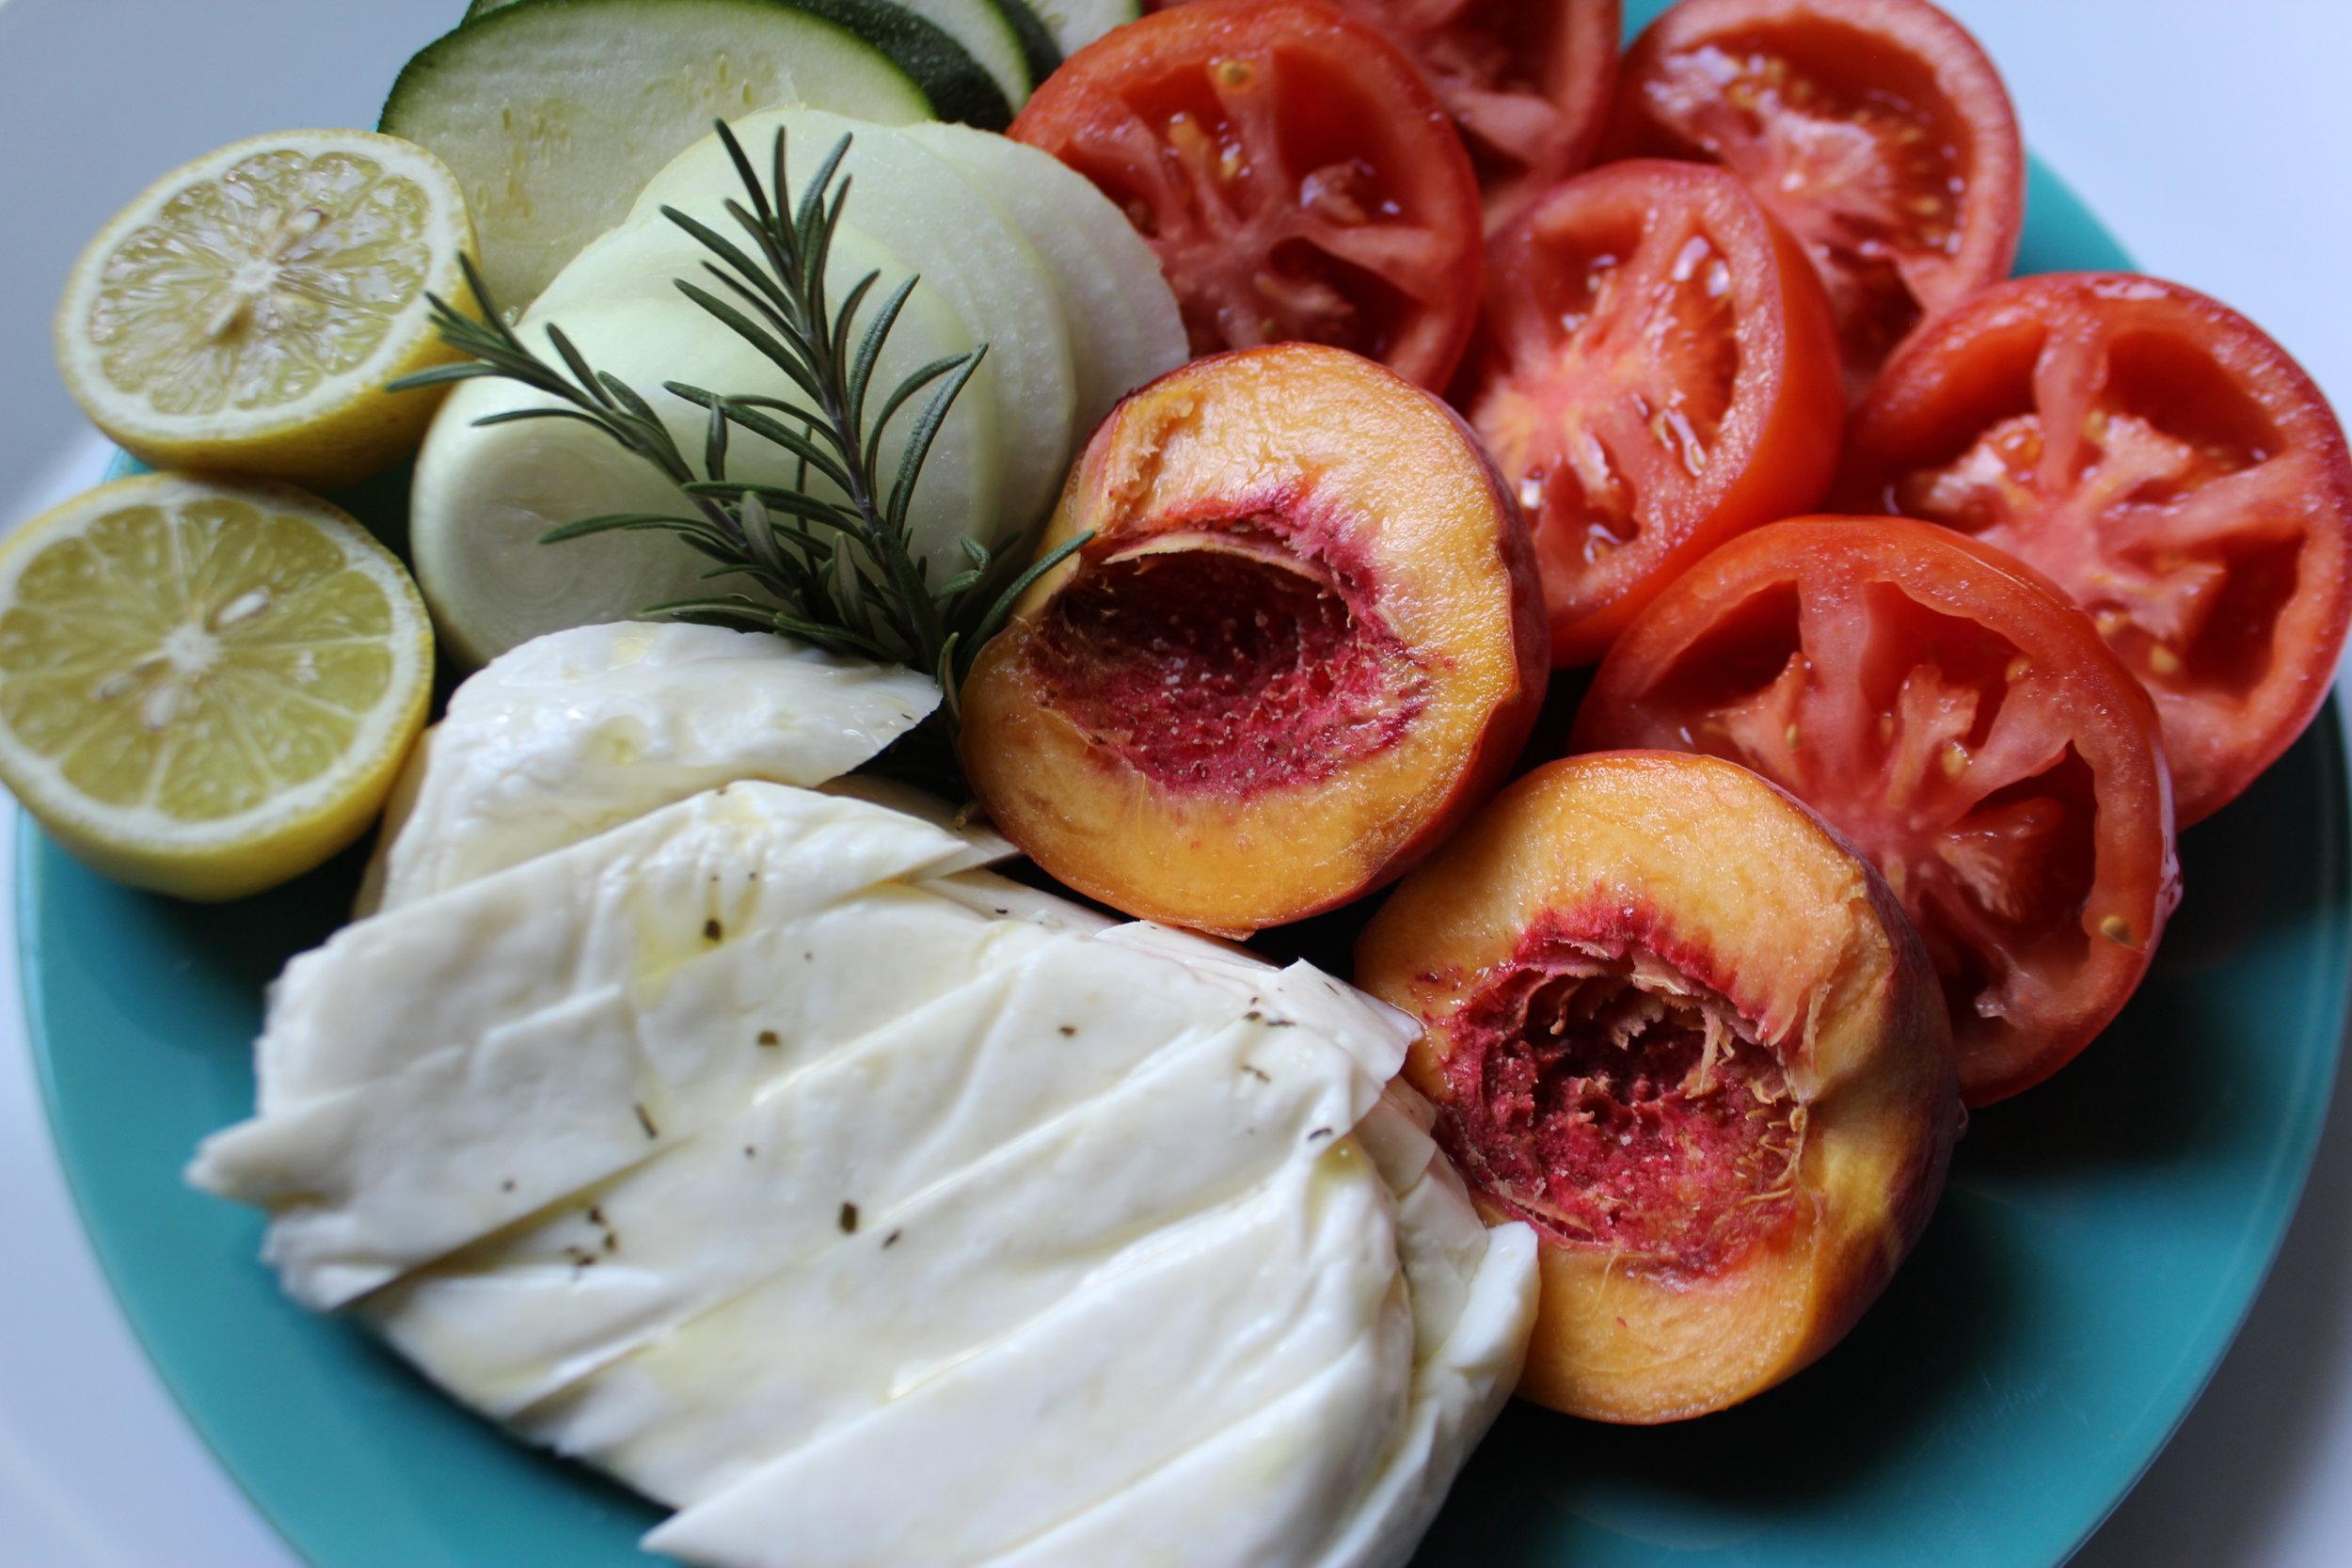 Haloumi, Peaches, Lemons, Tomatoes, Onion, Zucchini